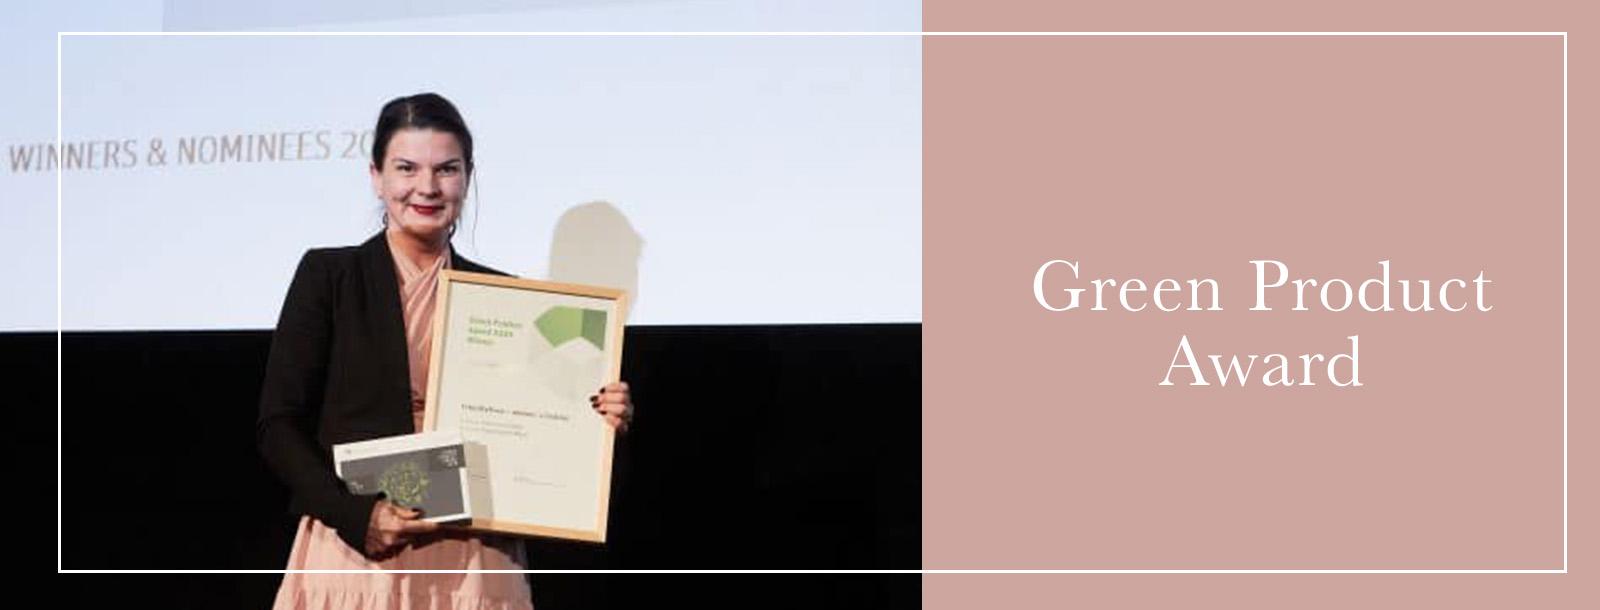 Green Product Award 2020